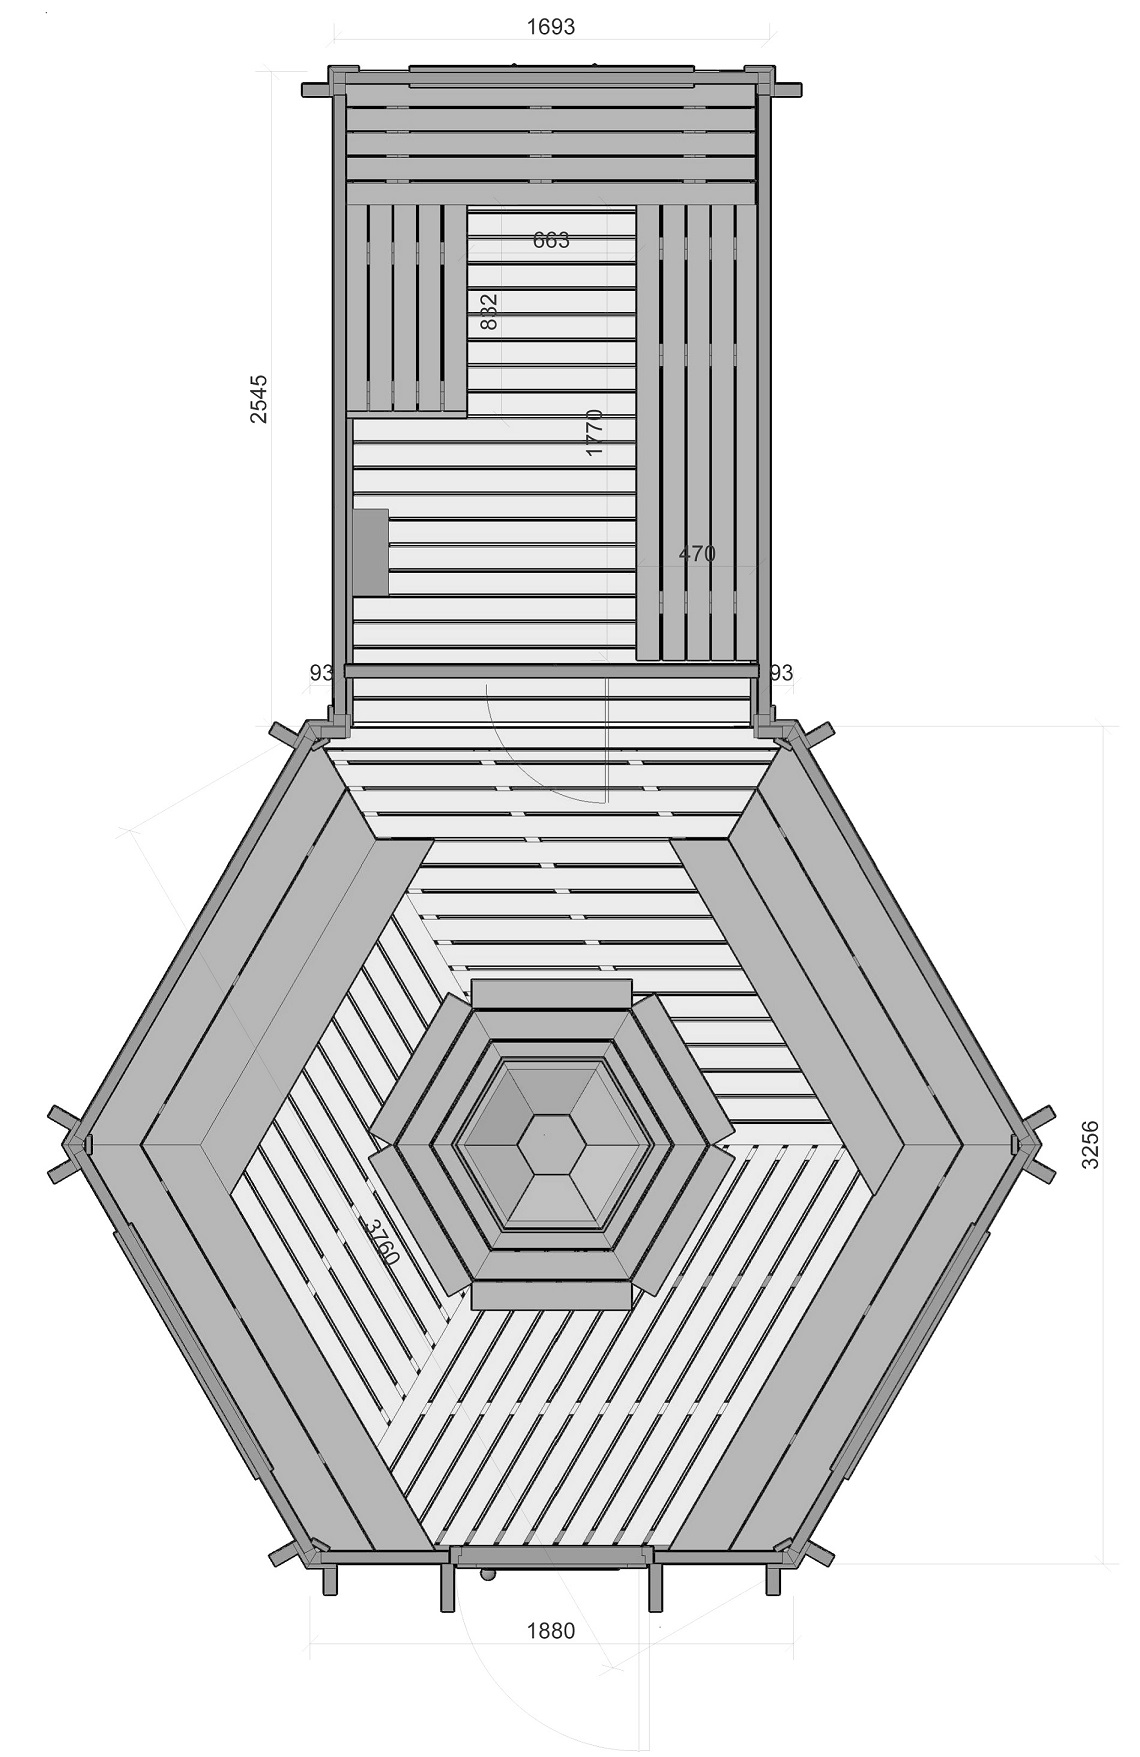 grillkota grillkotas saunakotas und viel mehr. Black Bedroom Furniture Sets. Home Design Ideas